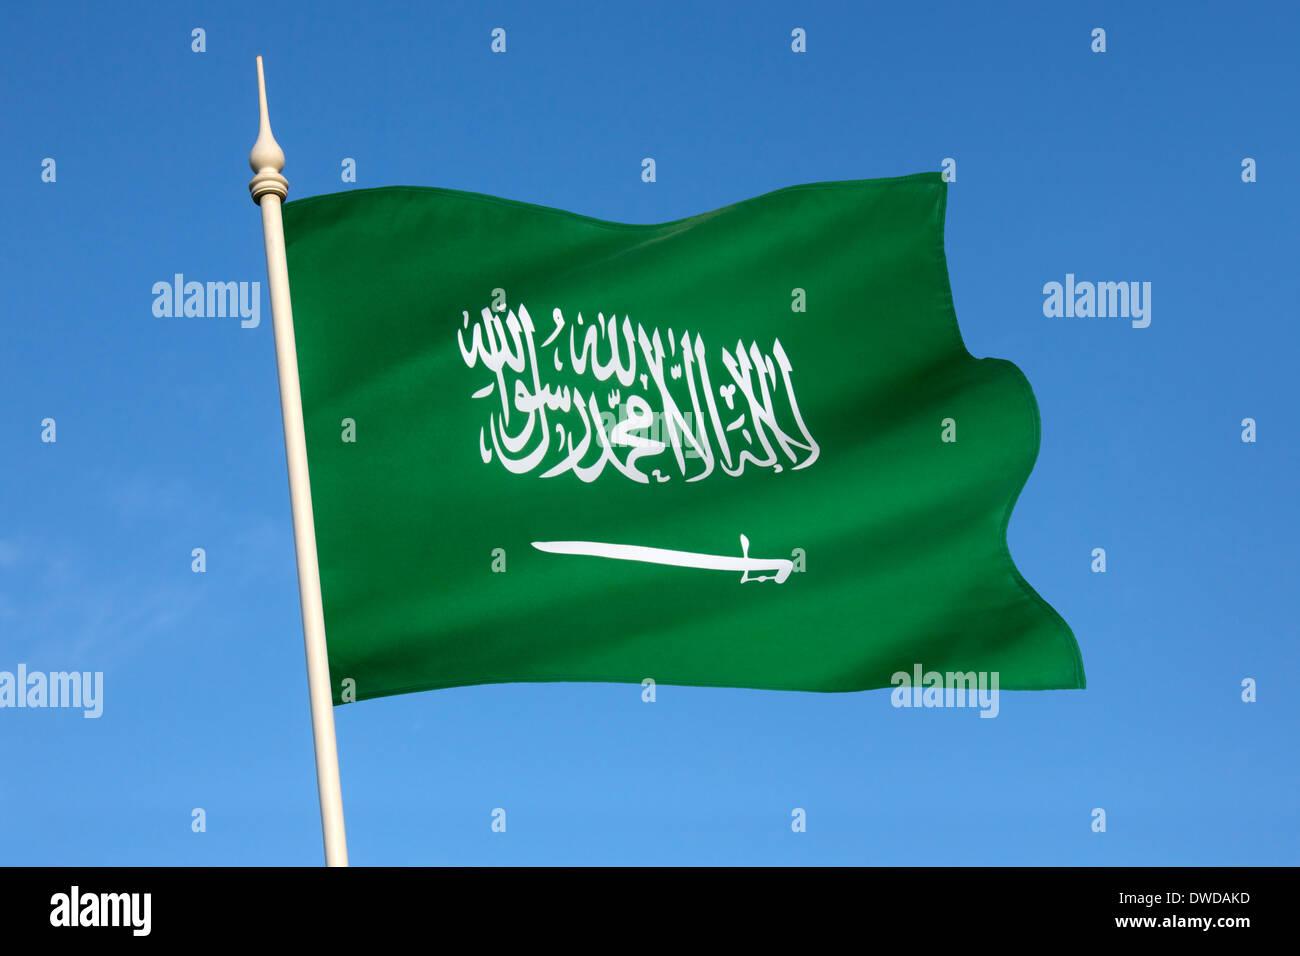 Flag of Saudi Arabia - Stock Image